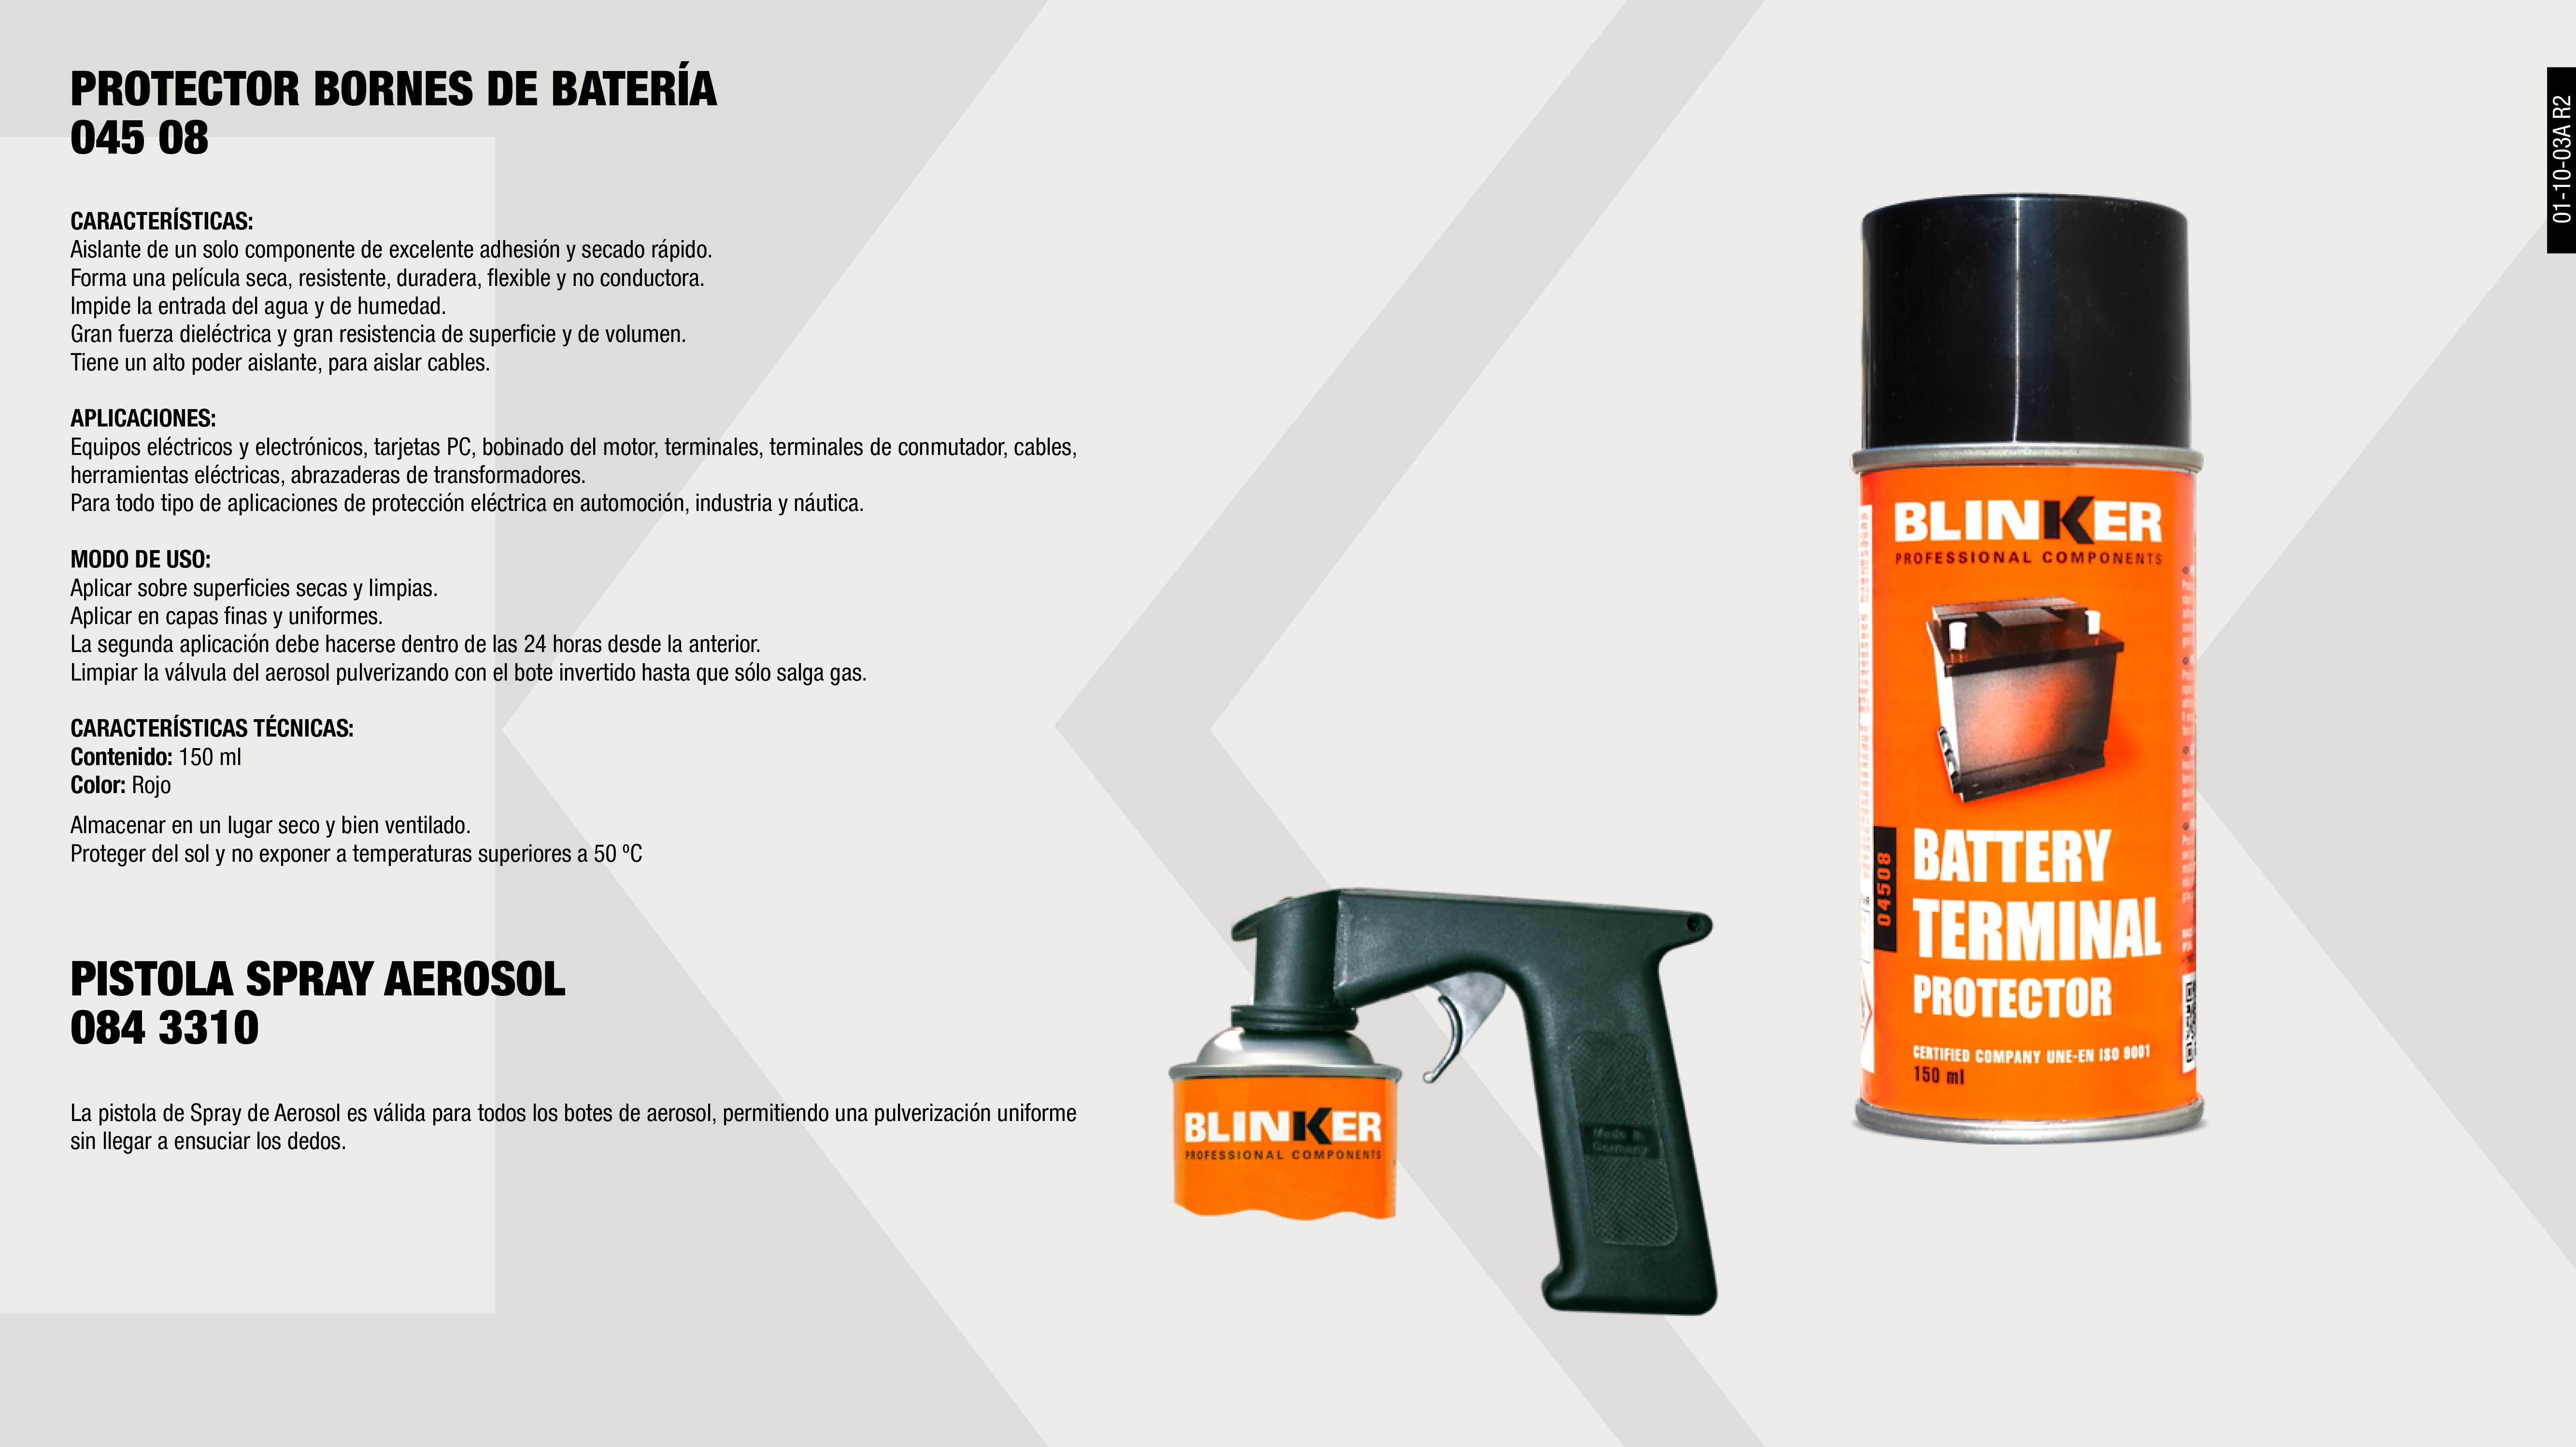 PROTECTOR BORNES BATERIA BLINKER 150 ML.                    ,  PISTOLA SPRAY AEROSOL                                       ,